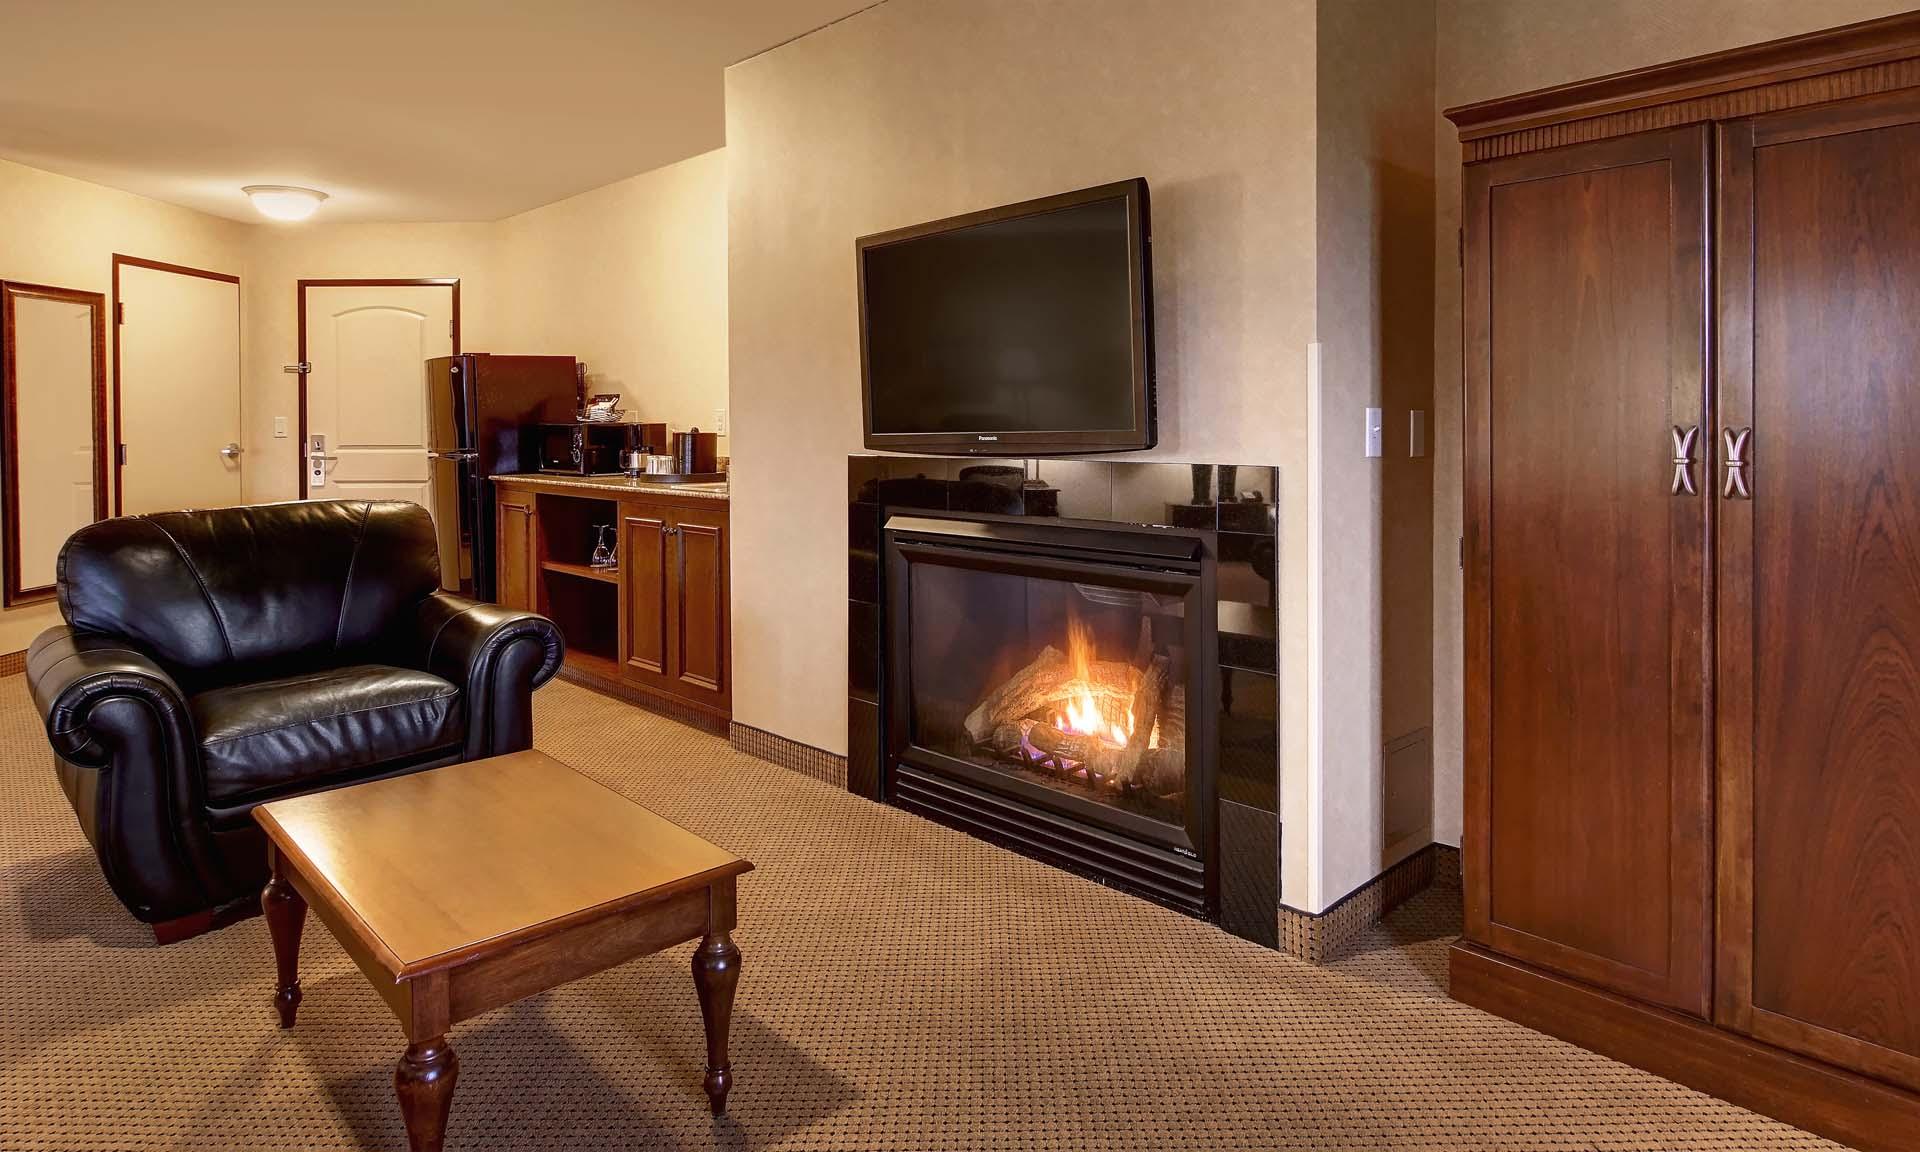 Tigard Hotel Suites Tualatin Hotel Rooms The Grand Hotel In Bridgeport Sw Portland Hotel